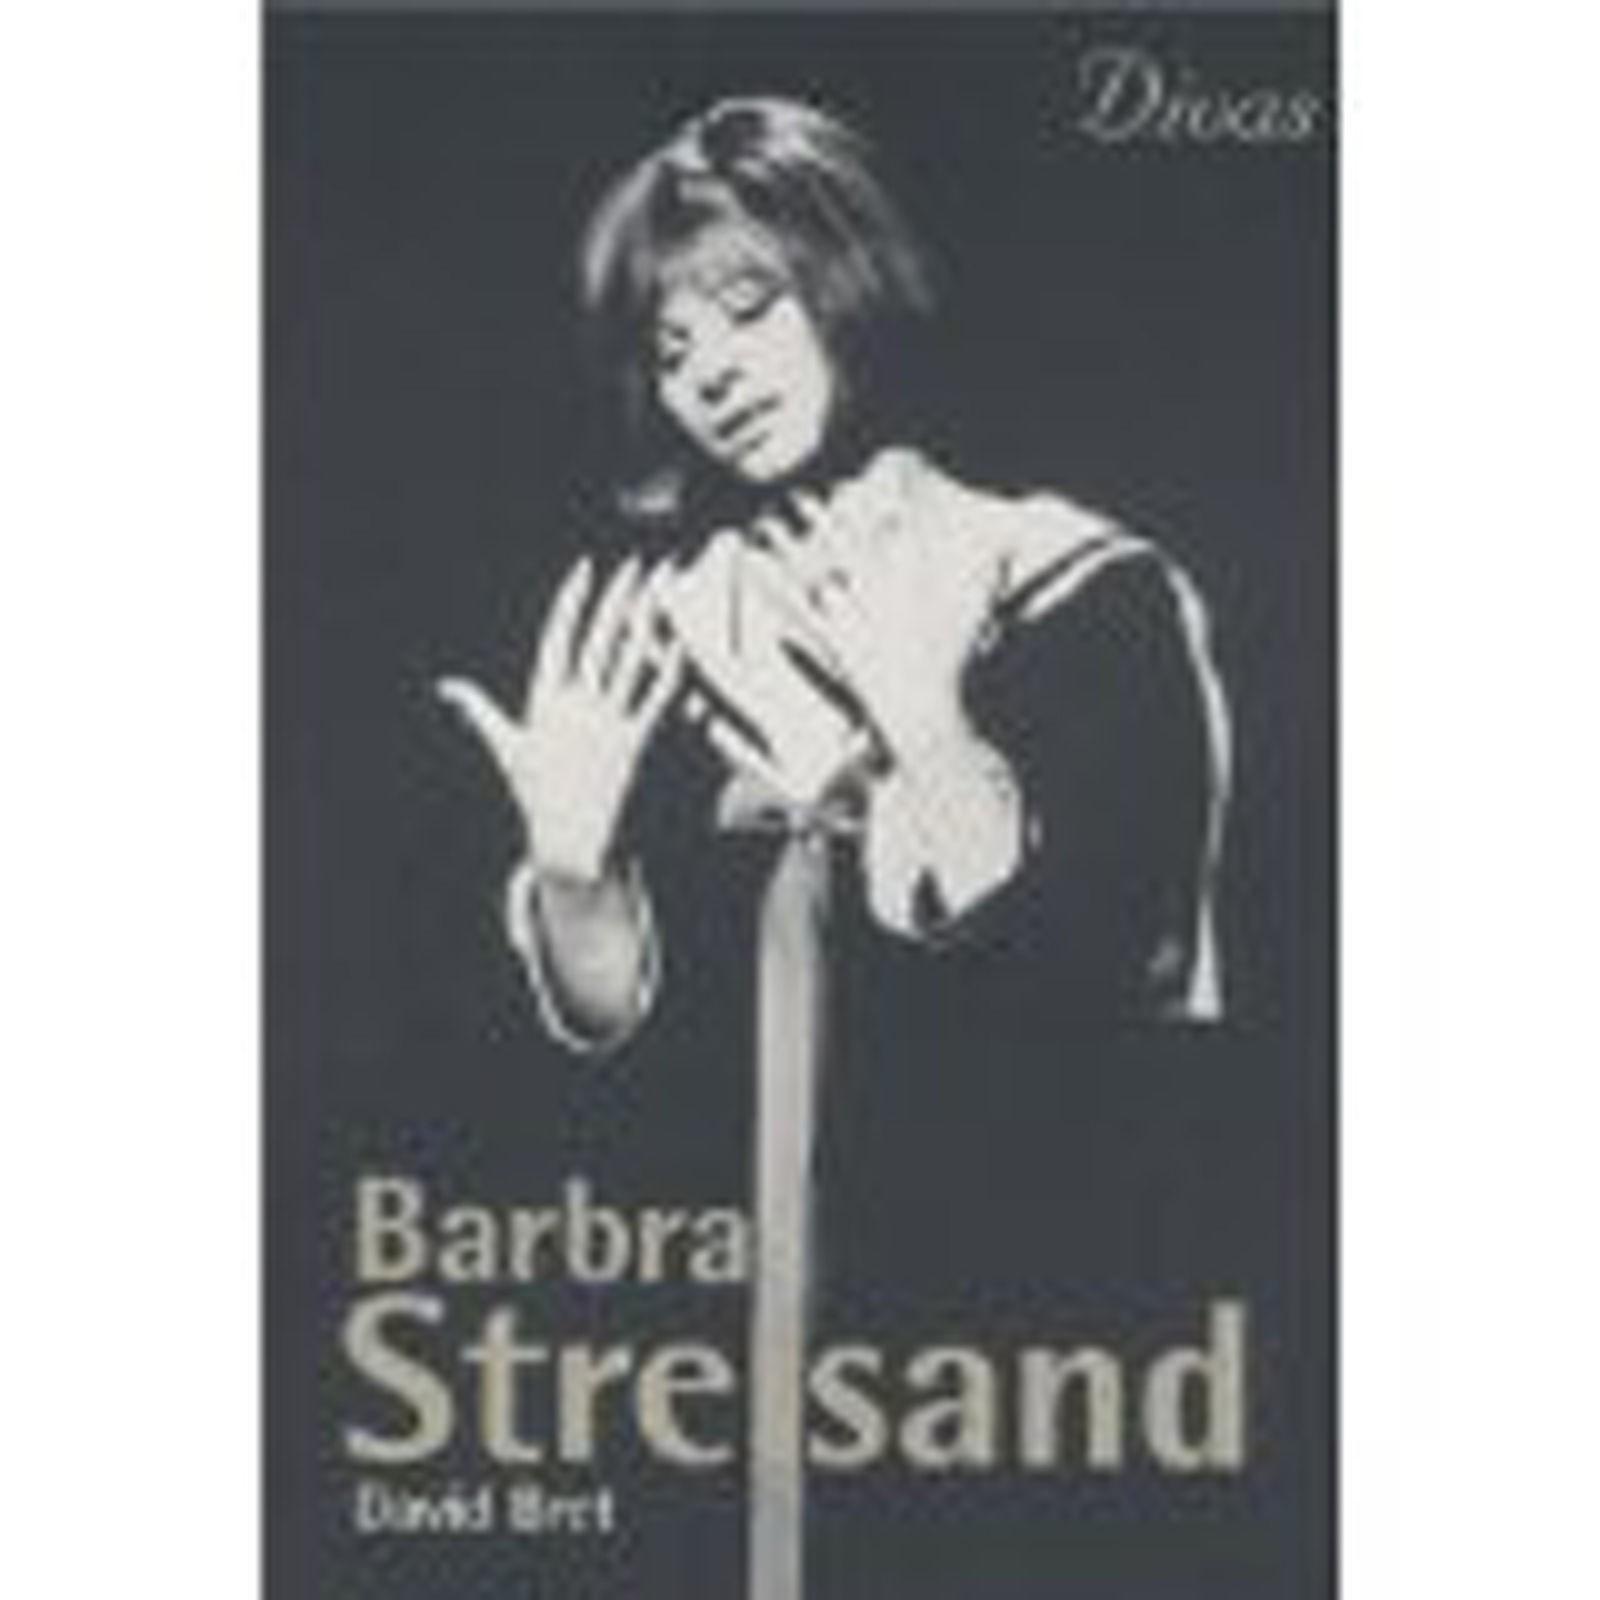 Barbra Streisand Divas Series David Bret Biography Memorabilia Photos Book S17